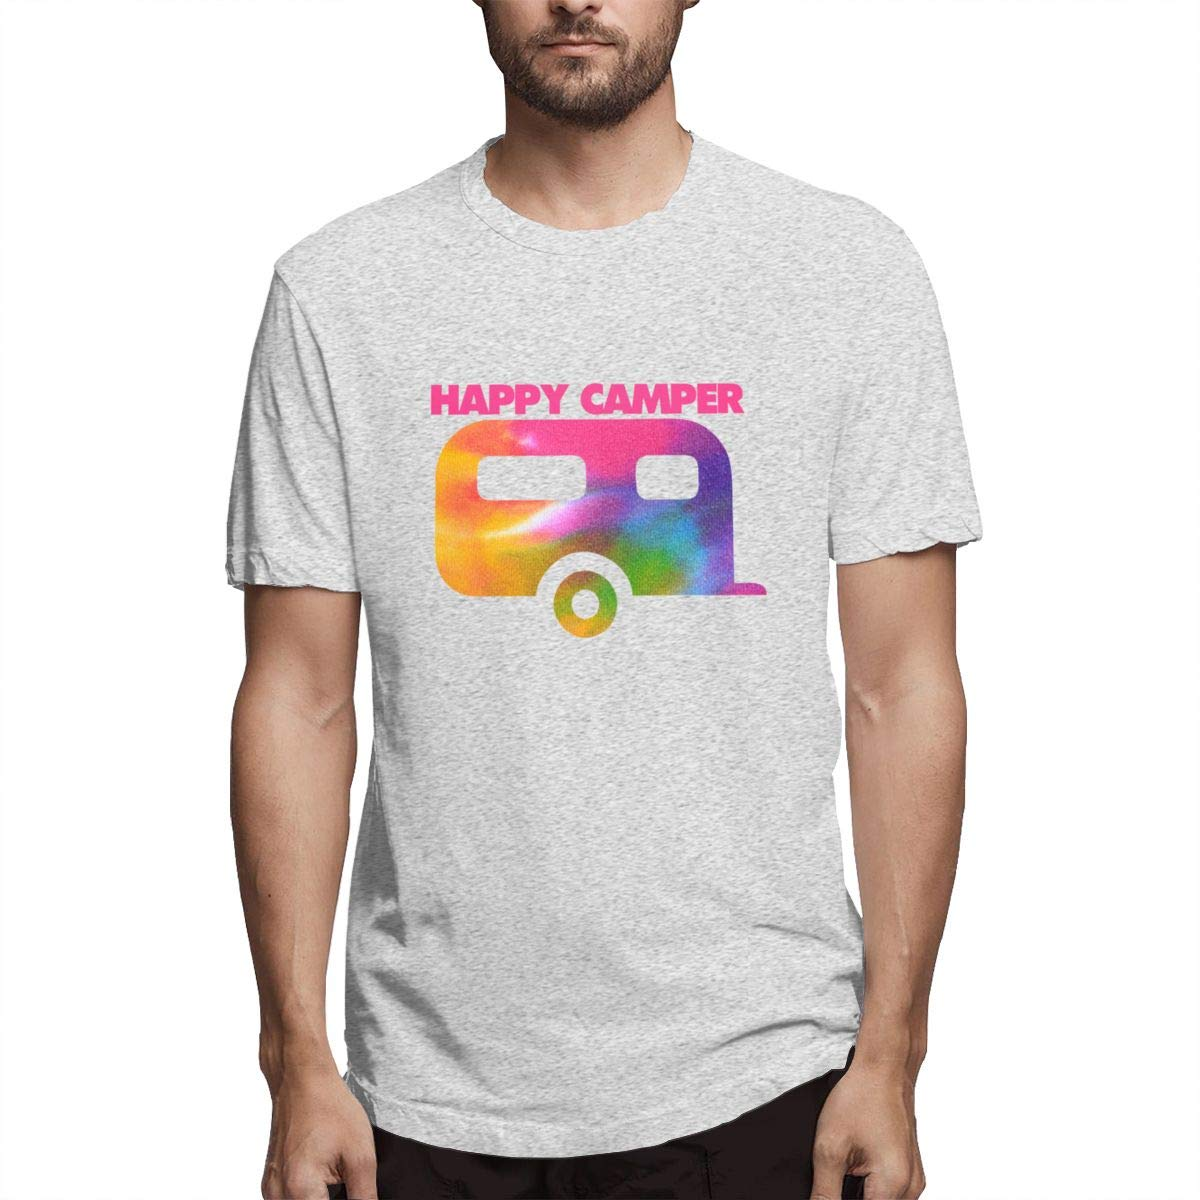 Luxendary Men Logo Happy Camper Man Basic Athletic Round Neck Short Sleeve T-Shirts